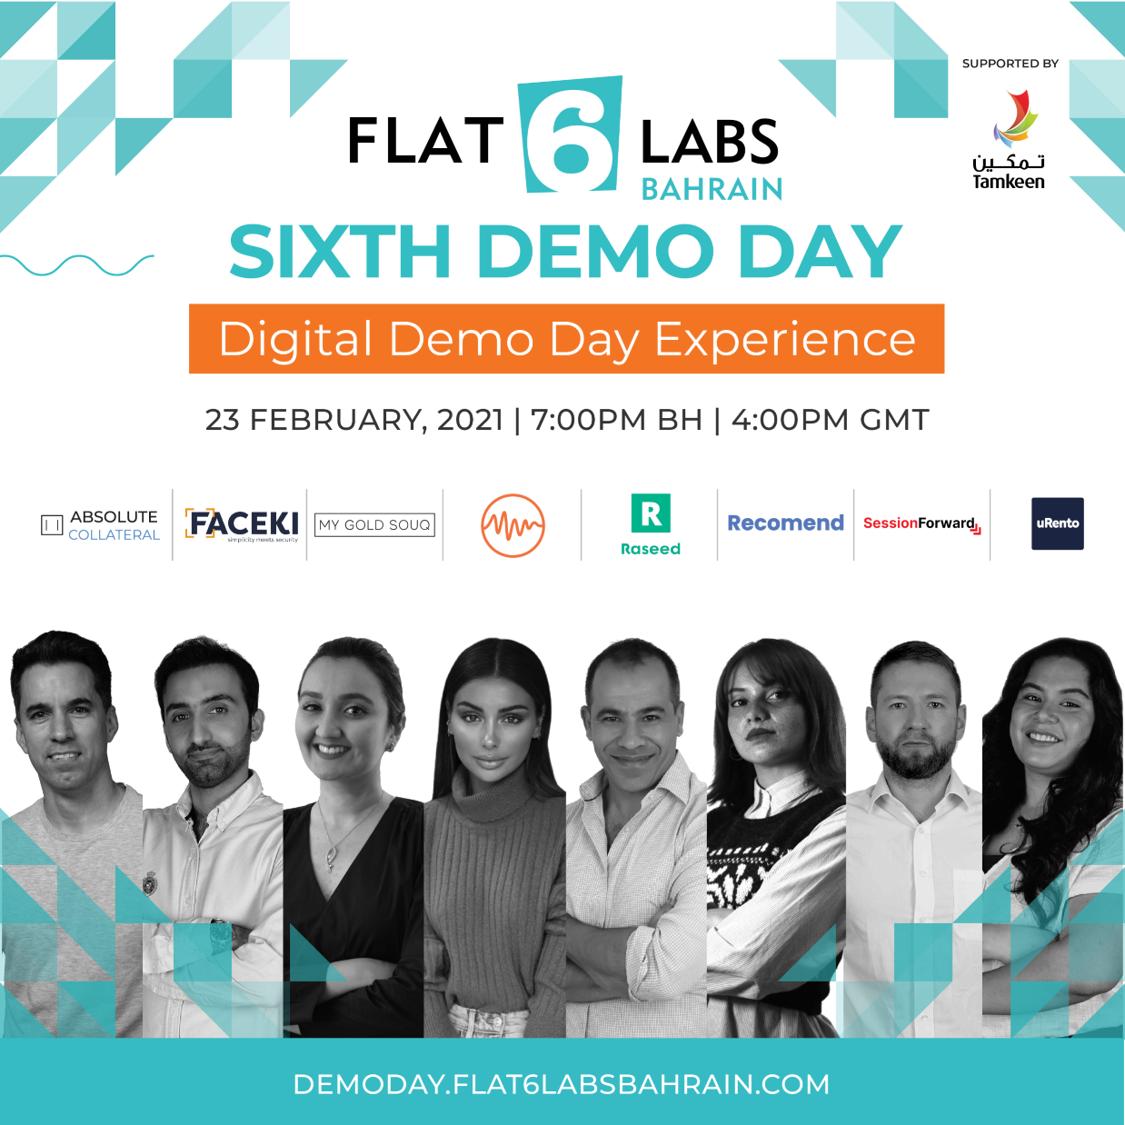 Flat6Labs Bahrain distributes $250,000 among cohort winners